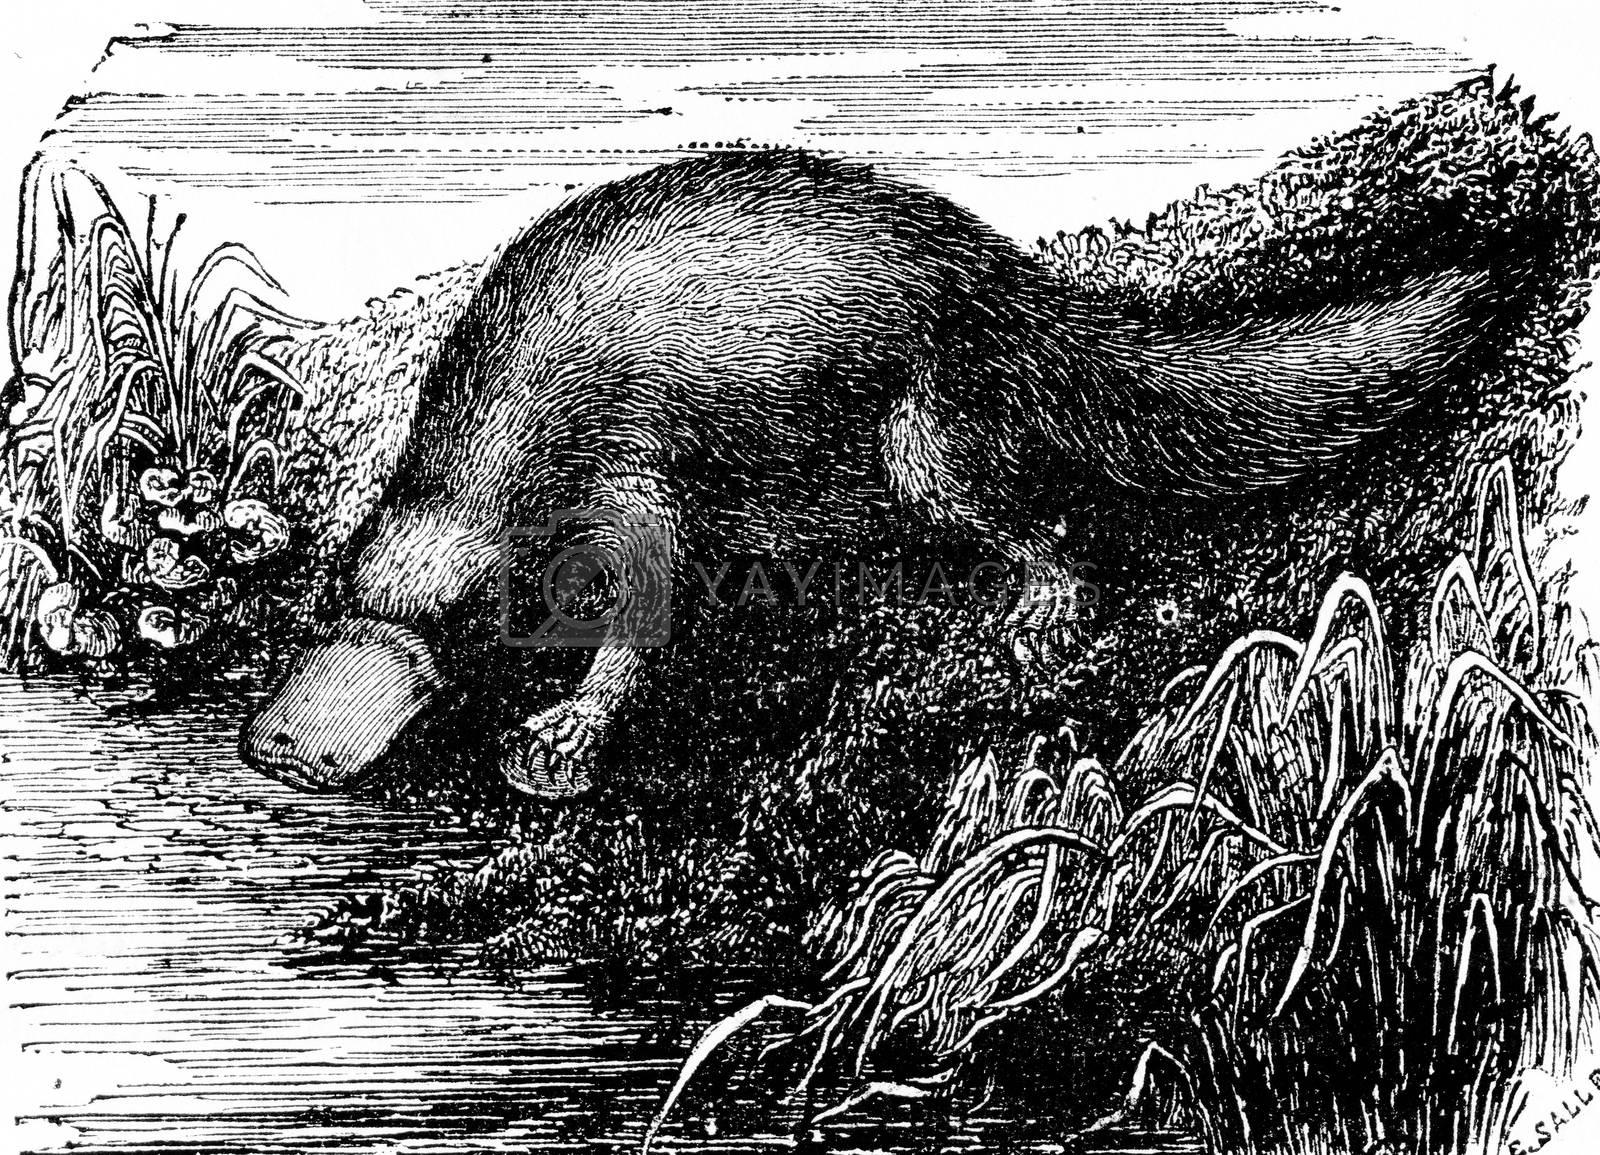 Platypus or Duck-billed platypus, vintage engraving. by Morphart